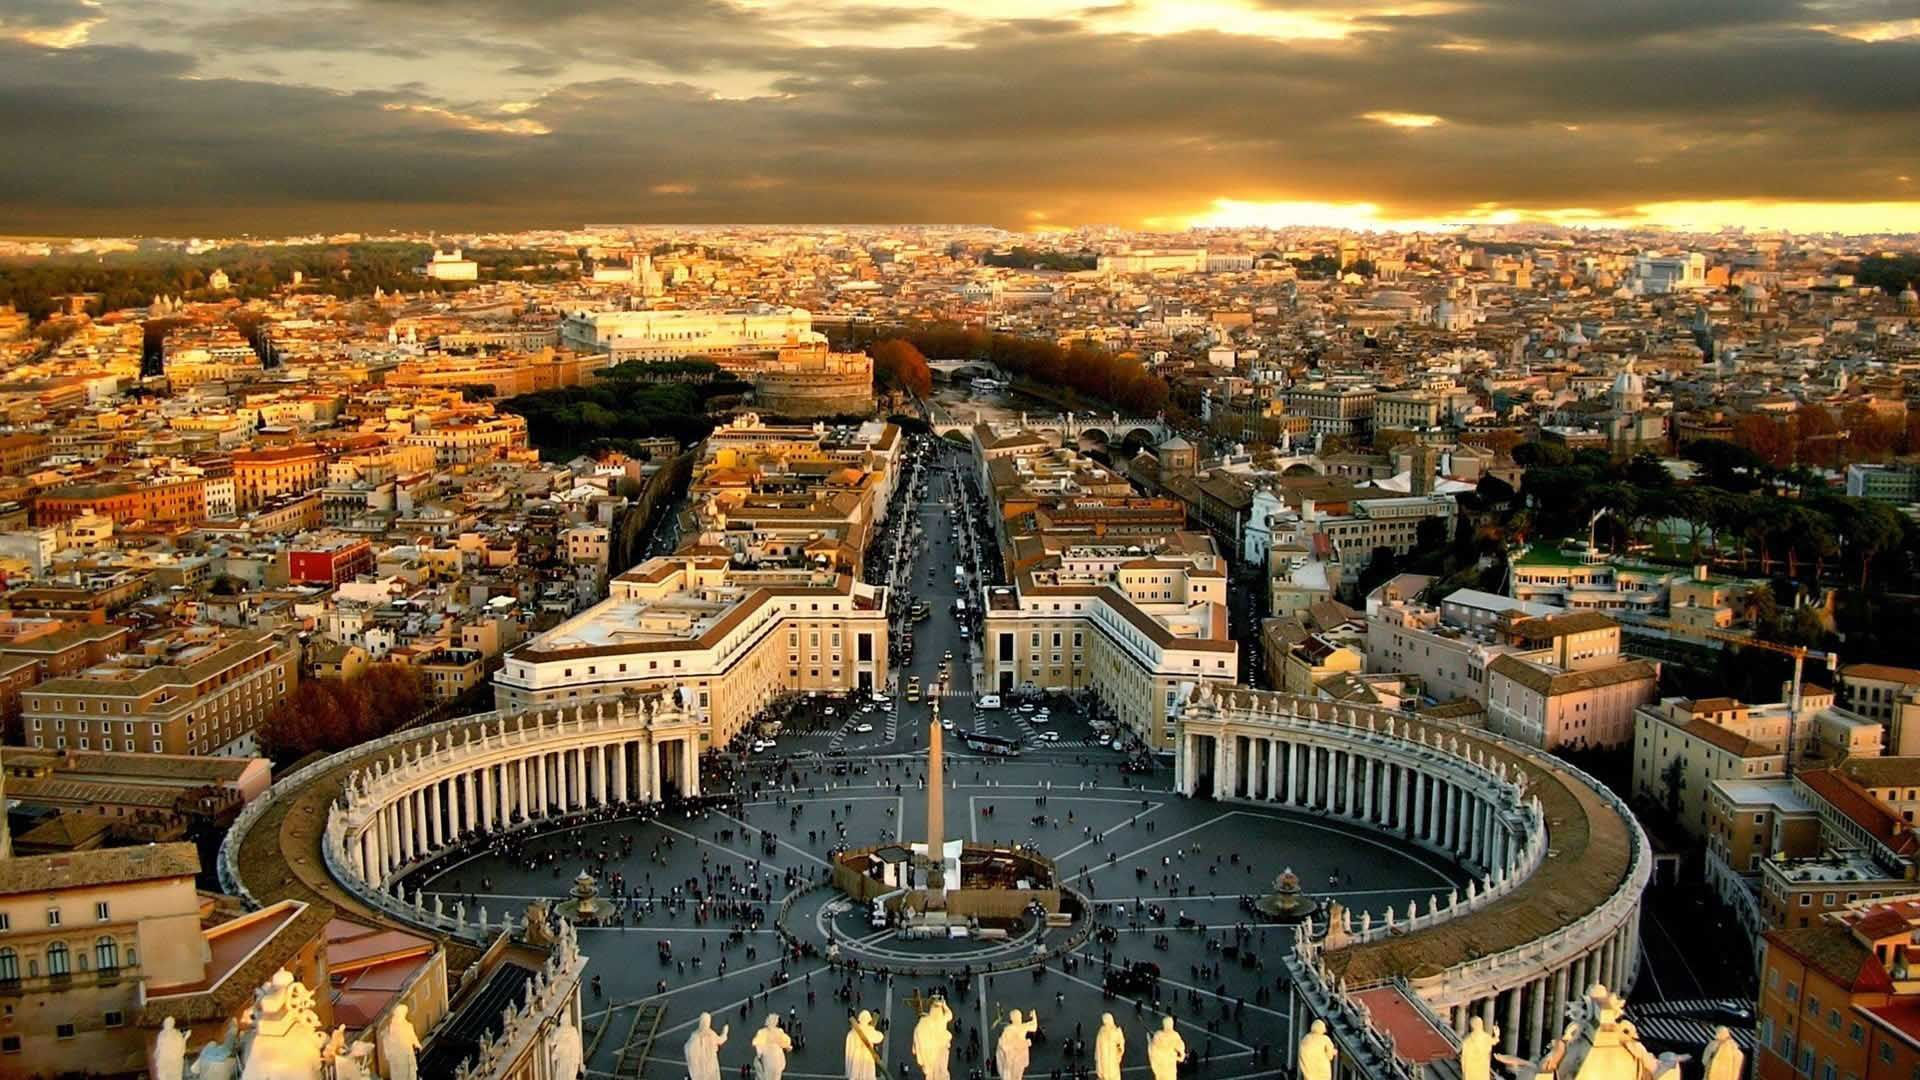 16 Luxury Pubg Wallpaper Iphone 6: Beautiful Wallpaper Of Rome Vatican City [1920x1080